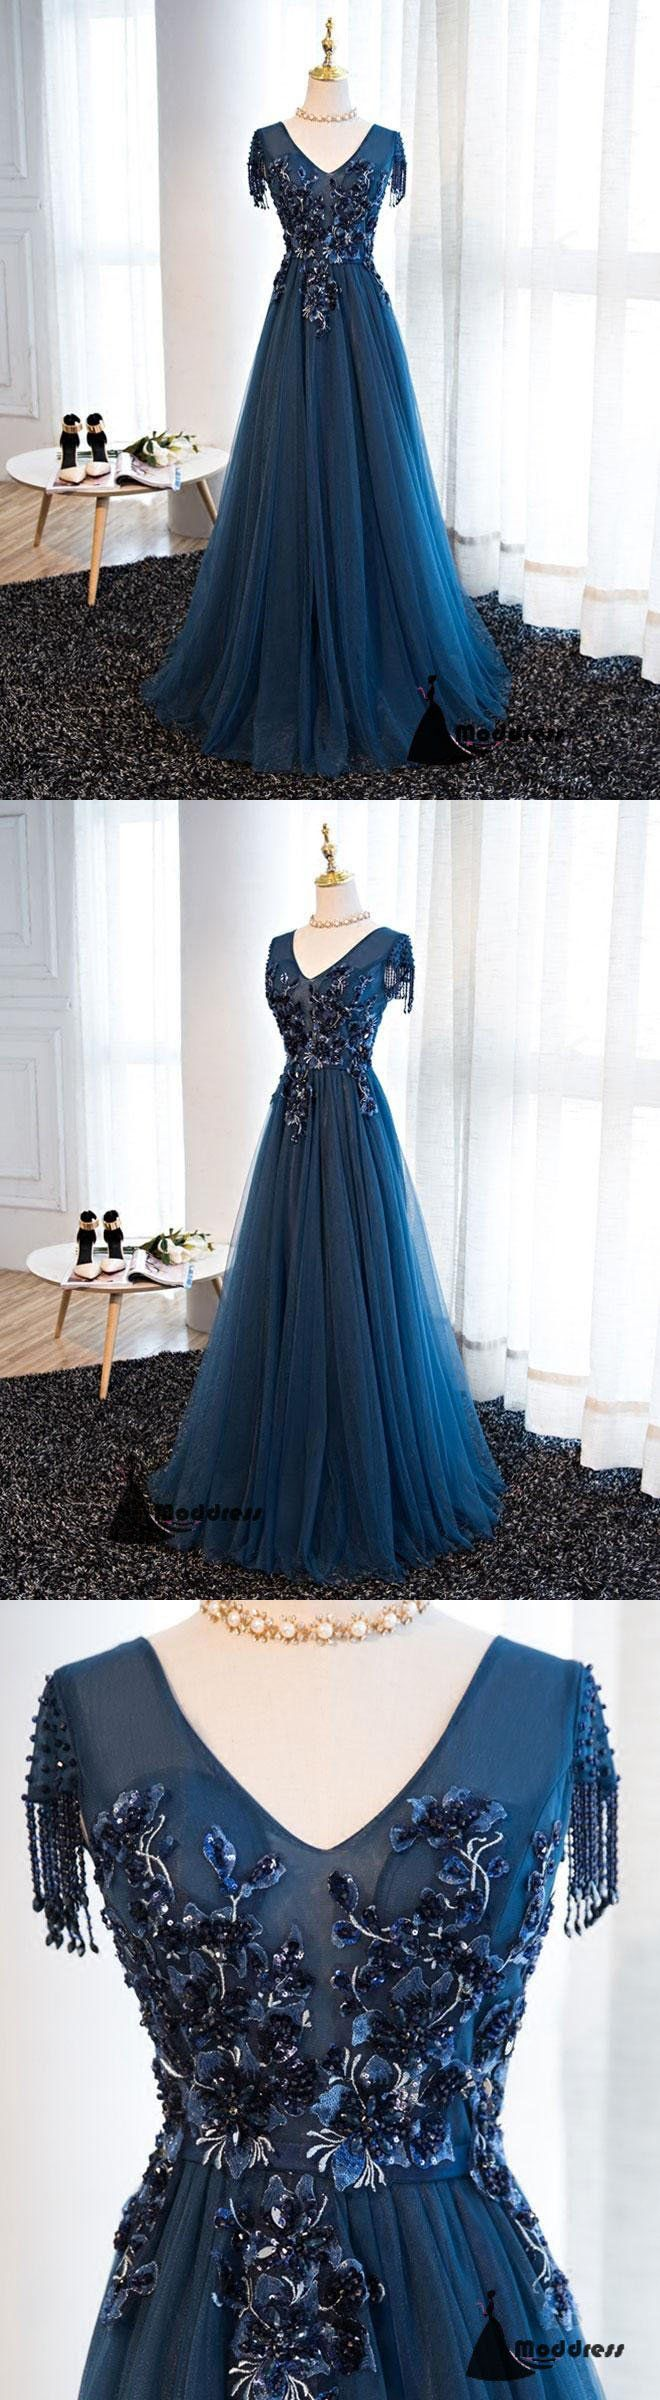 V-Neck Long Prom Dress Beaded A-Line Evening Dress Tulle Formal Dress,HS484  #fashion #shopping #promdresses #eveningdresses #prom #dresses